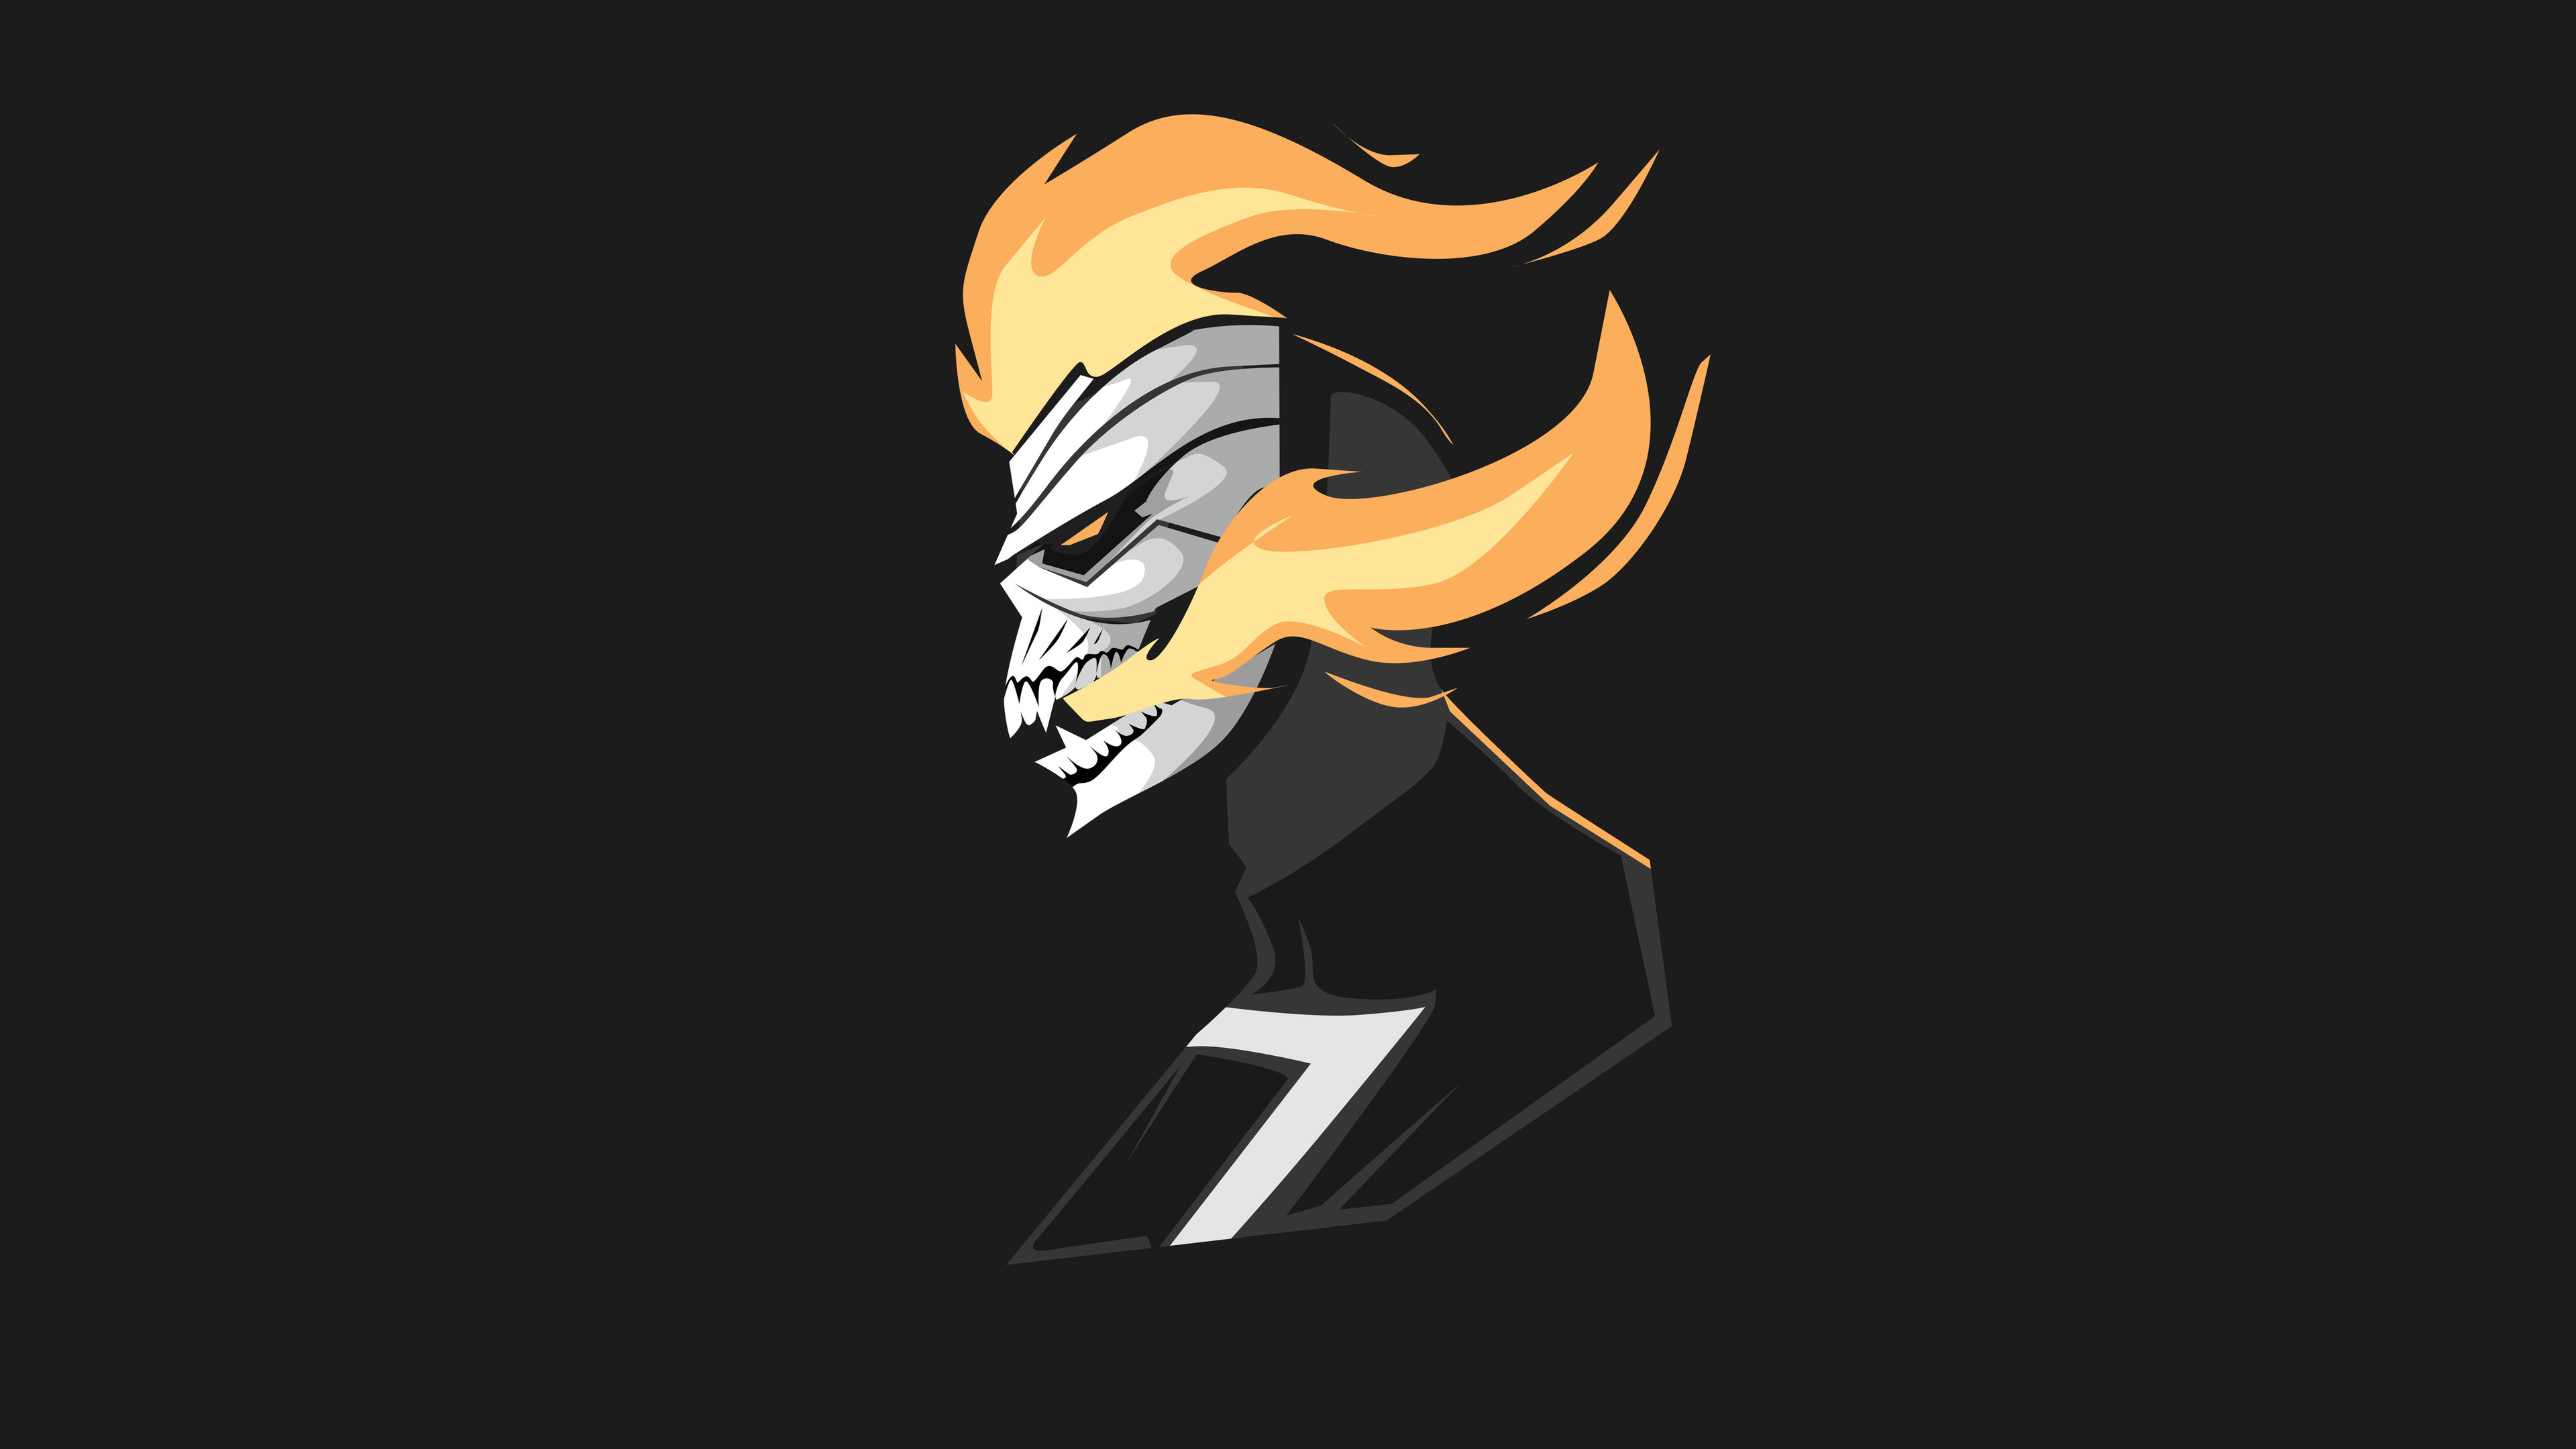 ghost rider 4k minimalism 1536523571 - Ghost Rider 4k Minimalism - superheroes wallpapers, minimalism wallpapers, hd-wallpapers, ghost rider wallpapers, artwork wallpapers, artstation wallpapers, artist wallpapers, 4k-wallpapers